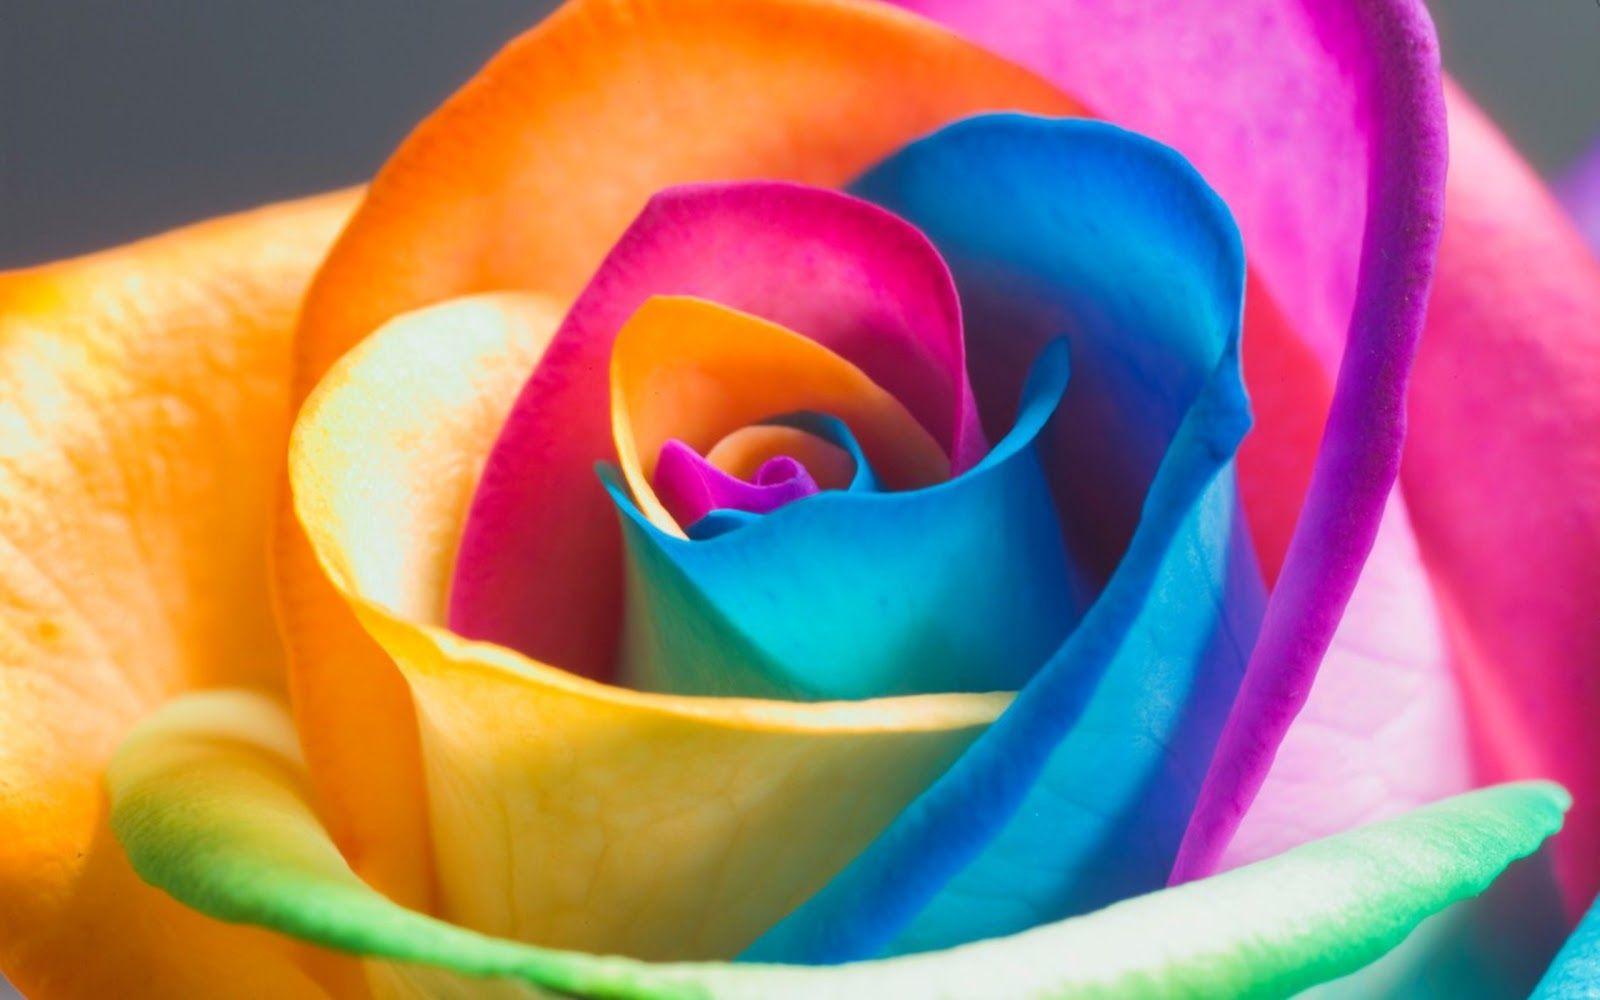 Qu Son Los Contenidos Evergreen Y Trending Pinterest Flowers